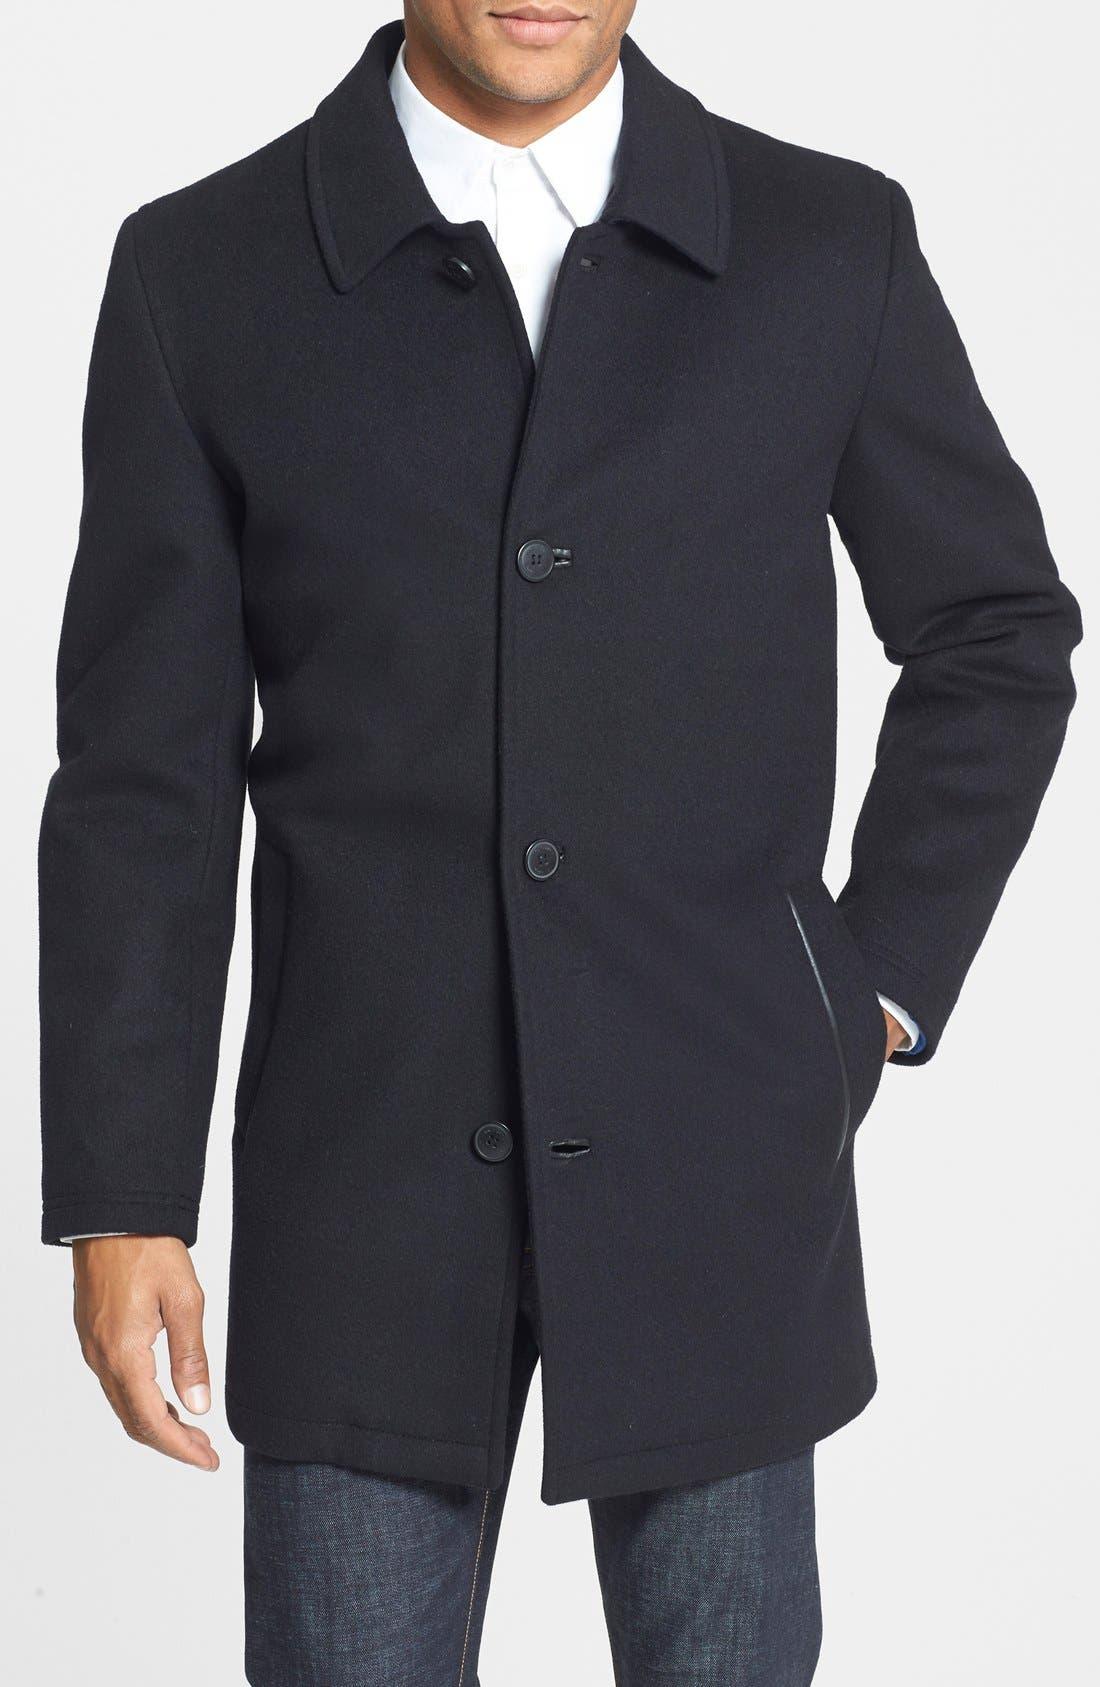 Main Image - Vince Camuto Water Repellent Wool Blend Car Coat